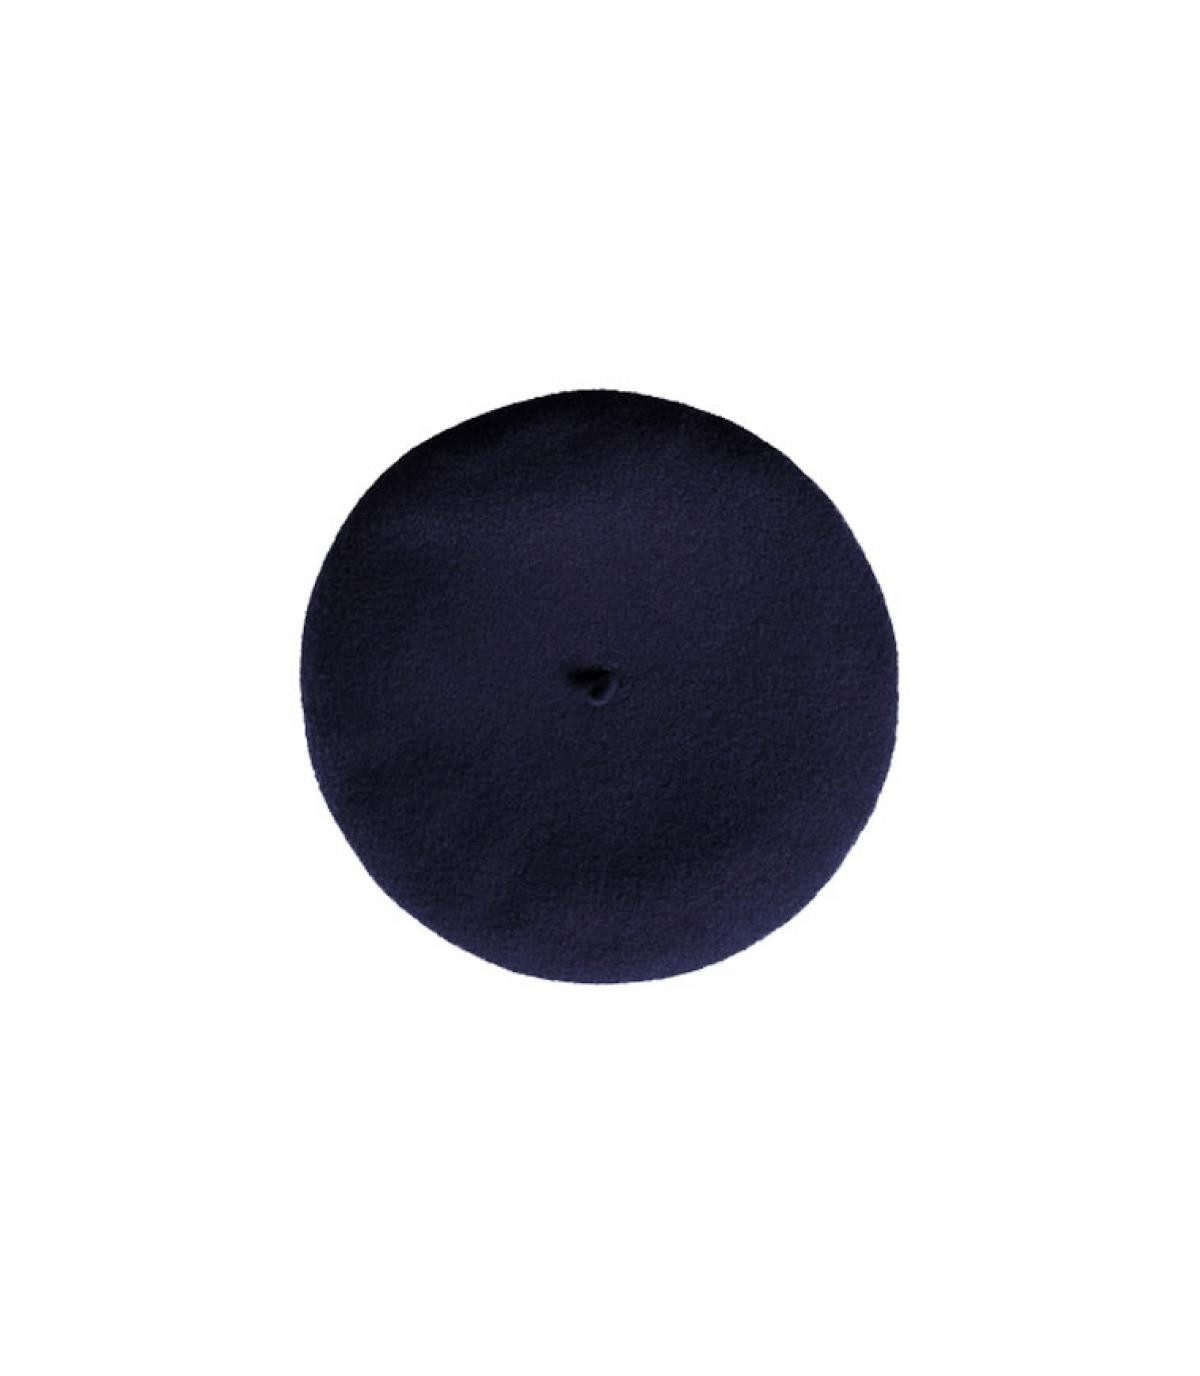 béret cachemire bleu marine